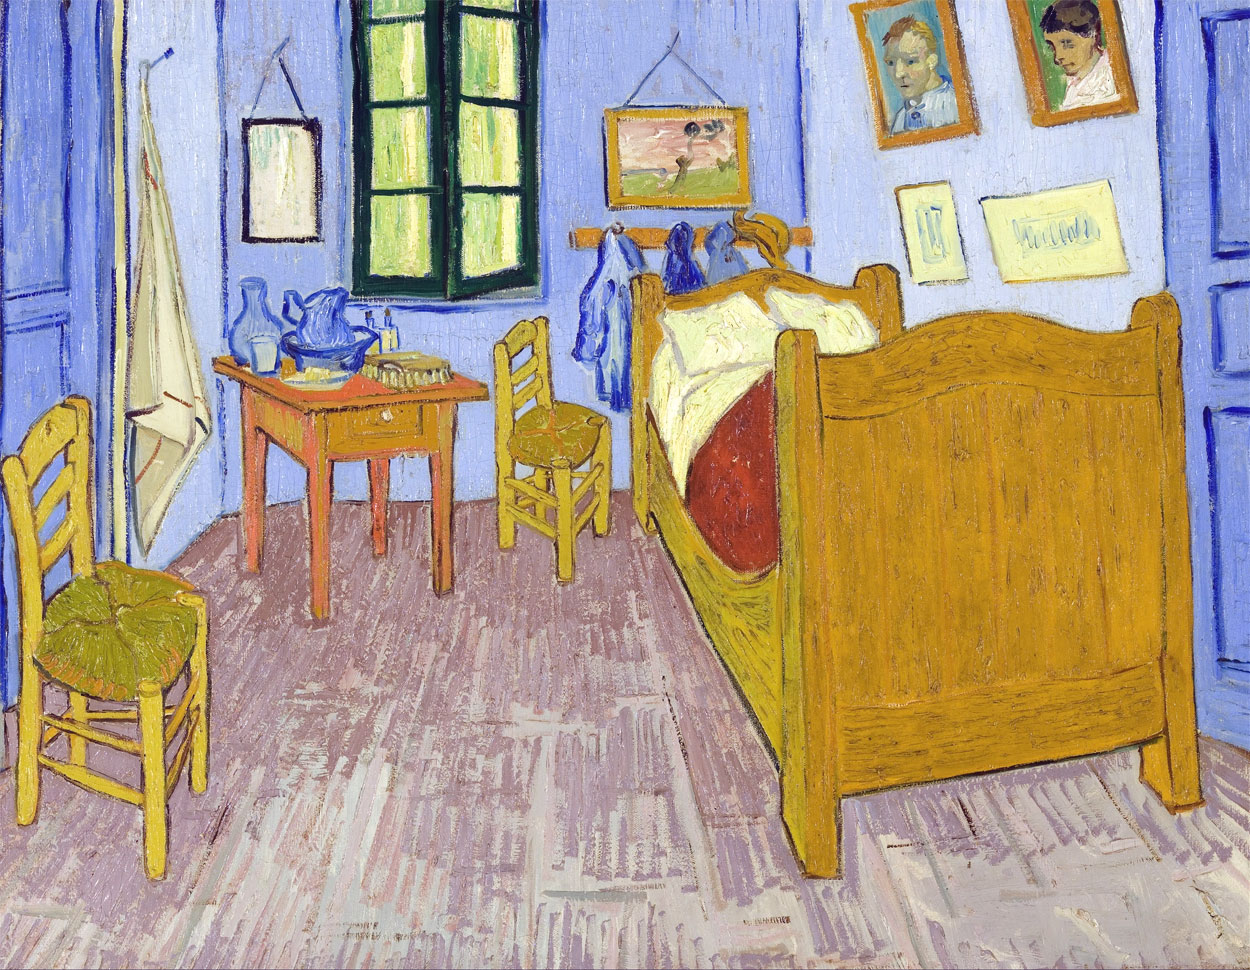 Le 10 opere più celebri di Vincent van Gogh